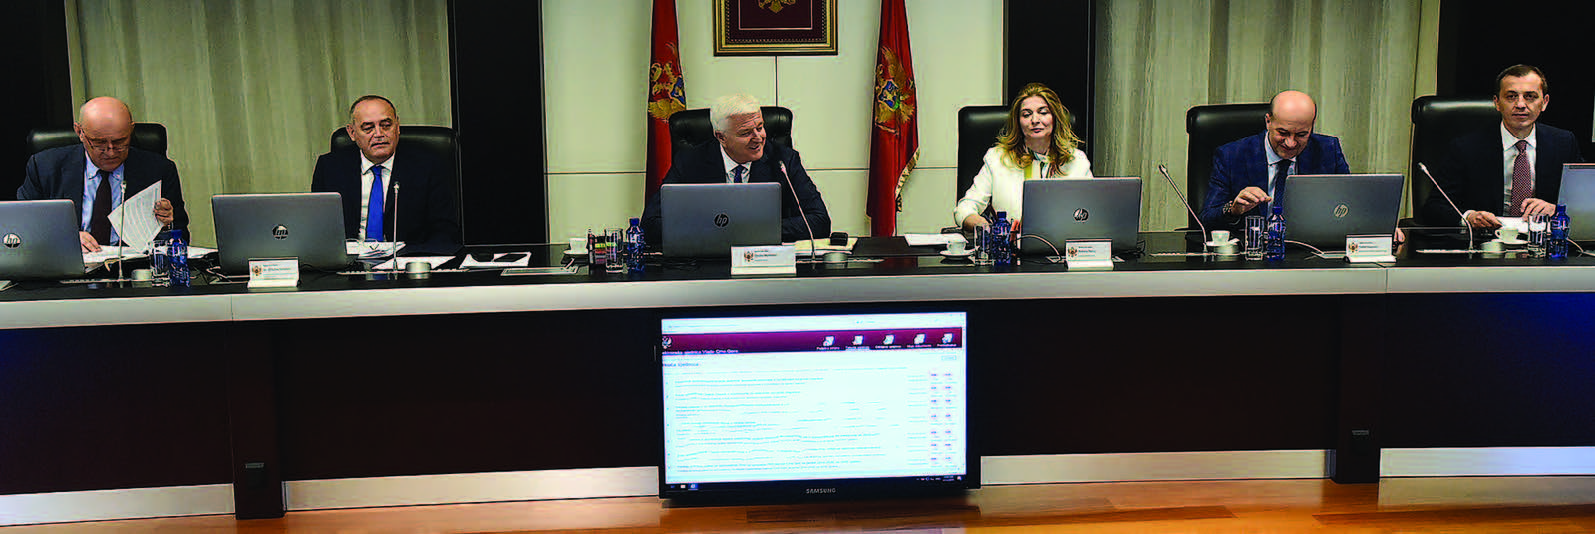 STANOVI ZA PRIVILEGOVANE: Stan kao orden za korupciju